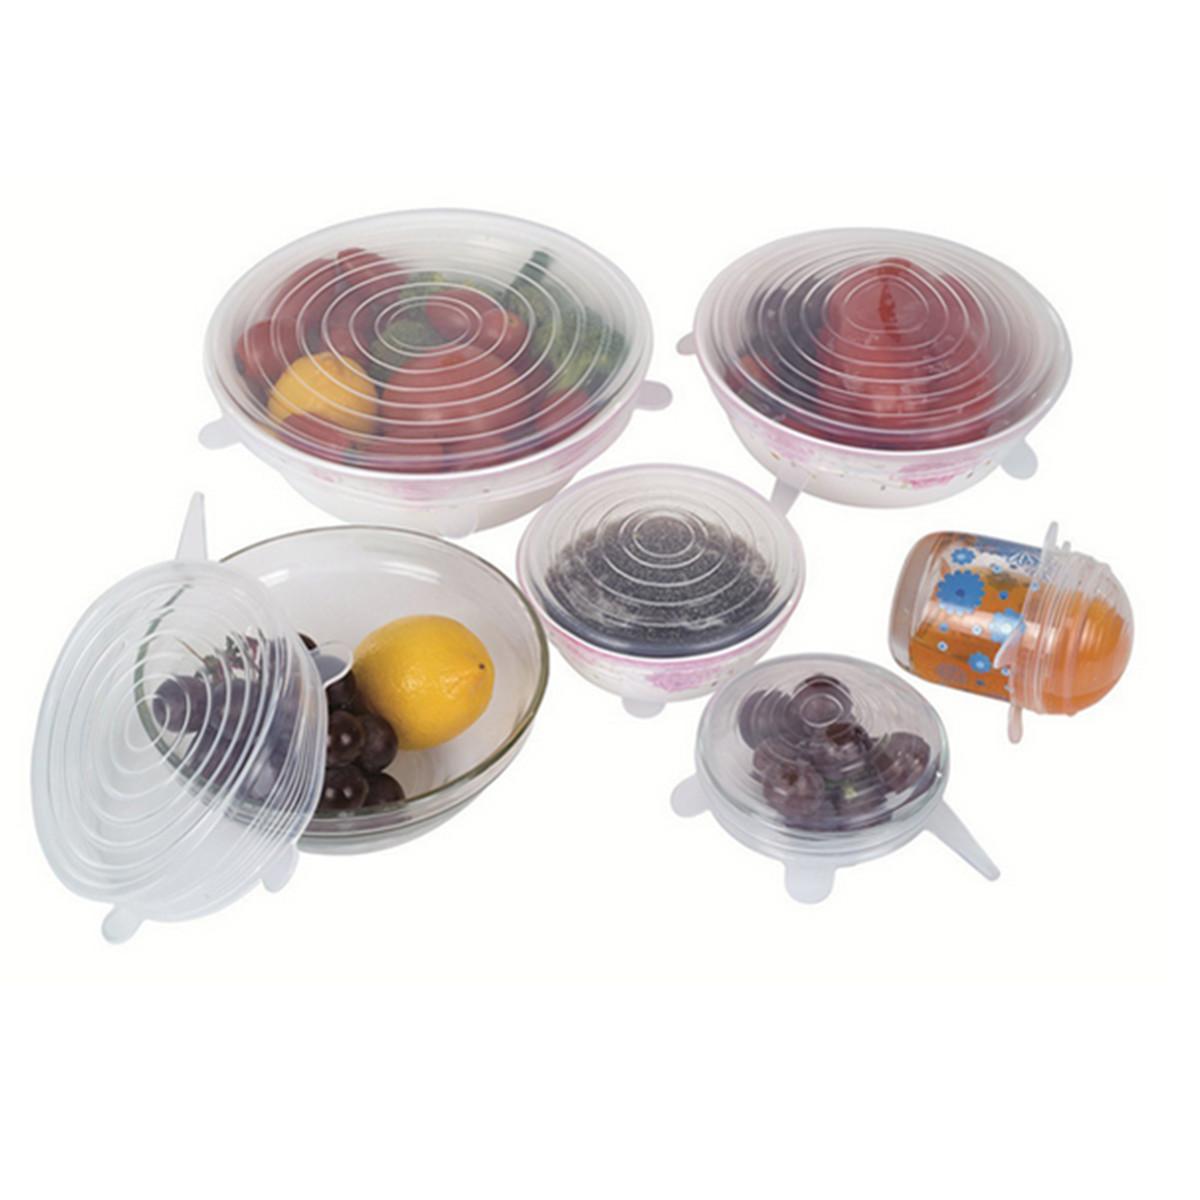 8PCS/SET Silicone Lids For Bowls Cups Food Preservation Reusable Cover Saver Stretch Lid Wrap